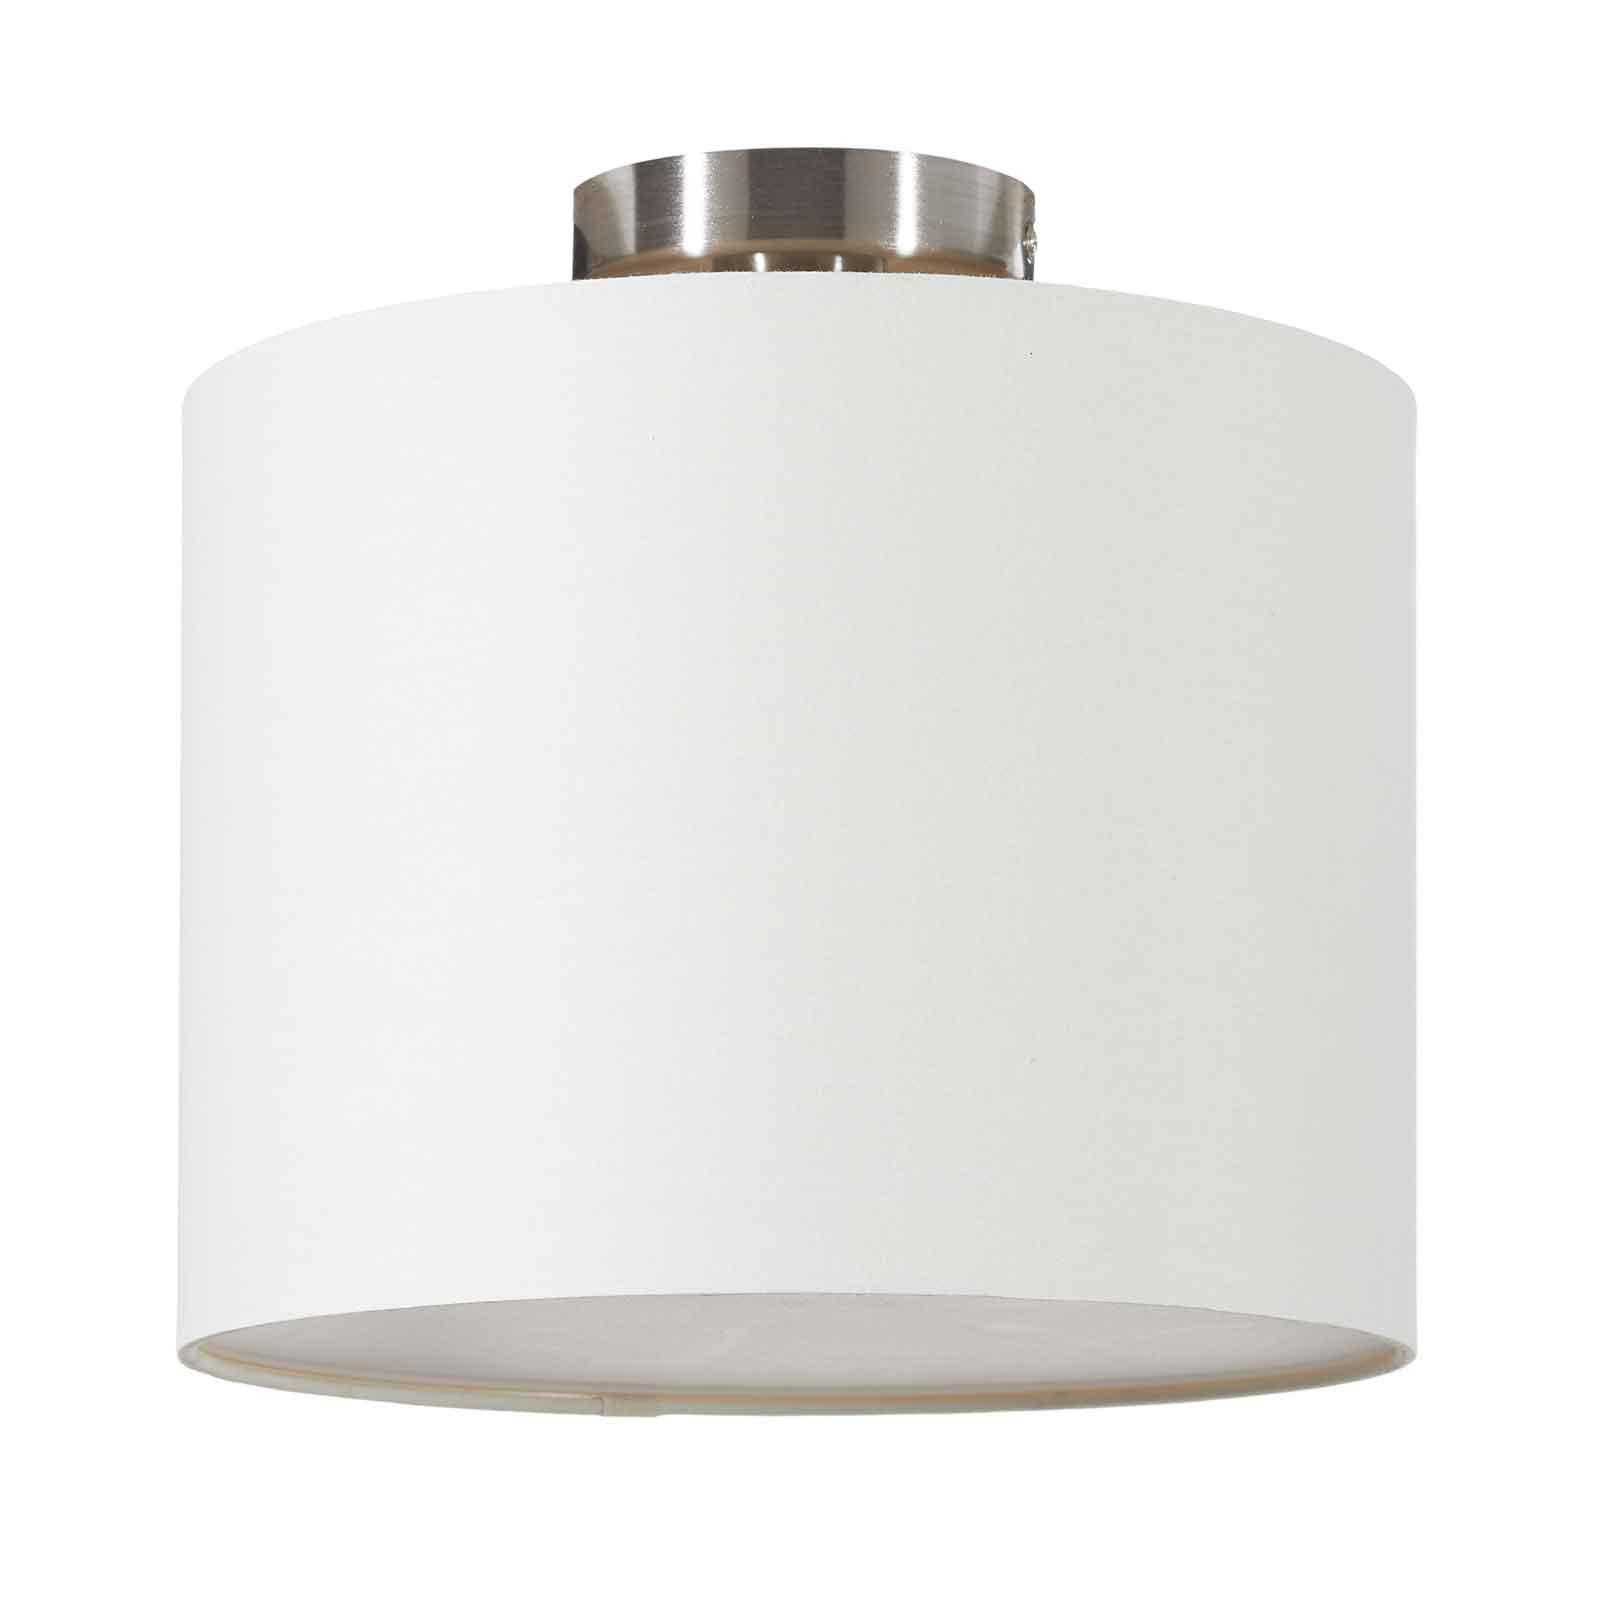 Lucande Patrik textiel-plafondlamp Ø30cm crème